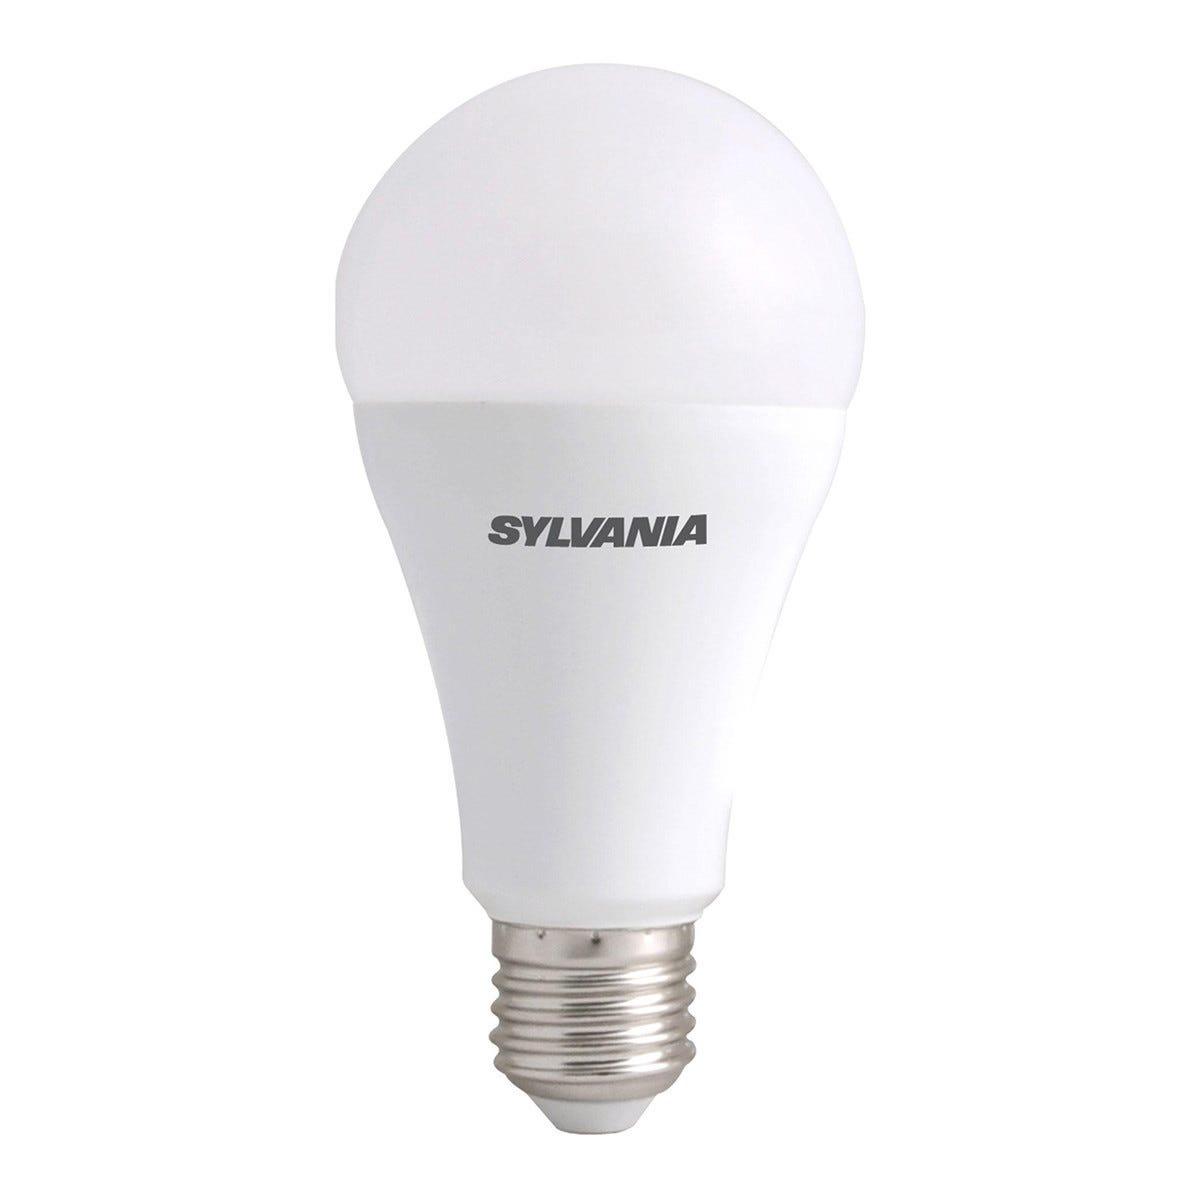 feilo_sylvania lampadina sylvania led goccia e27 11w=75 1060 lumen 2700k luce calda Ø67x136 mm dimmerabile